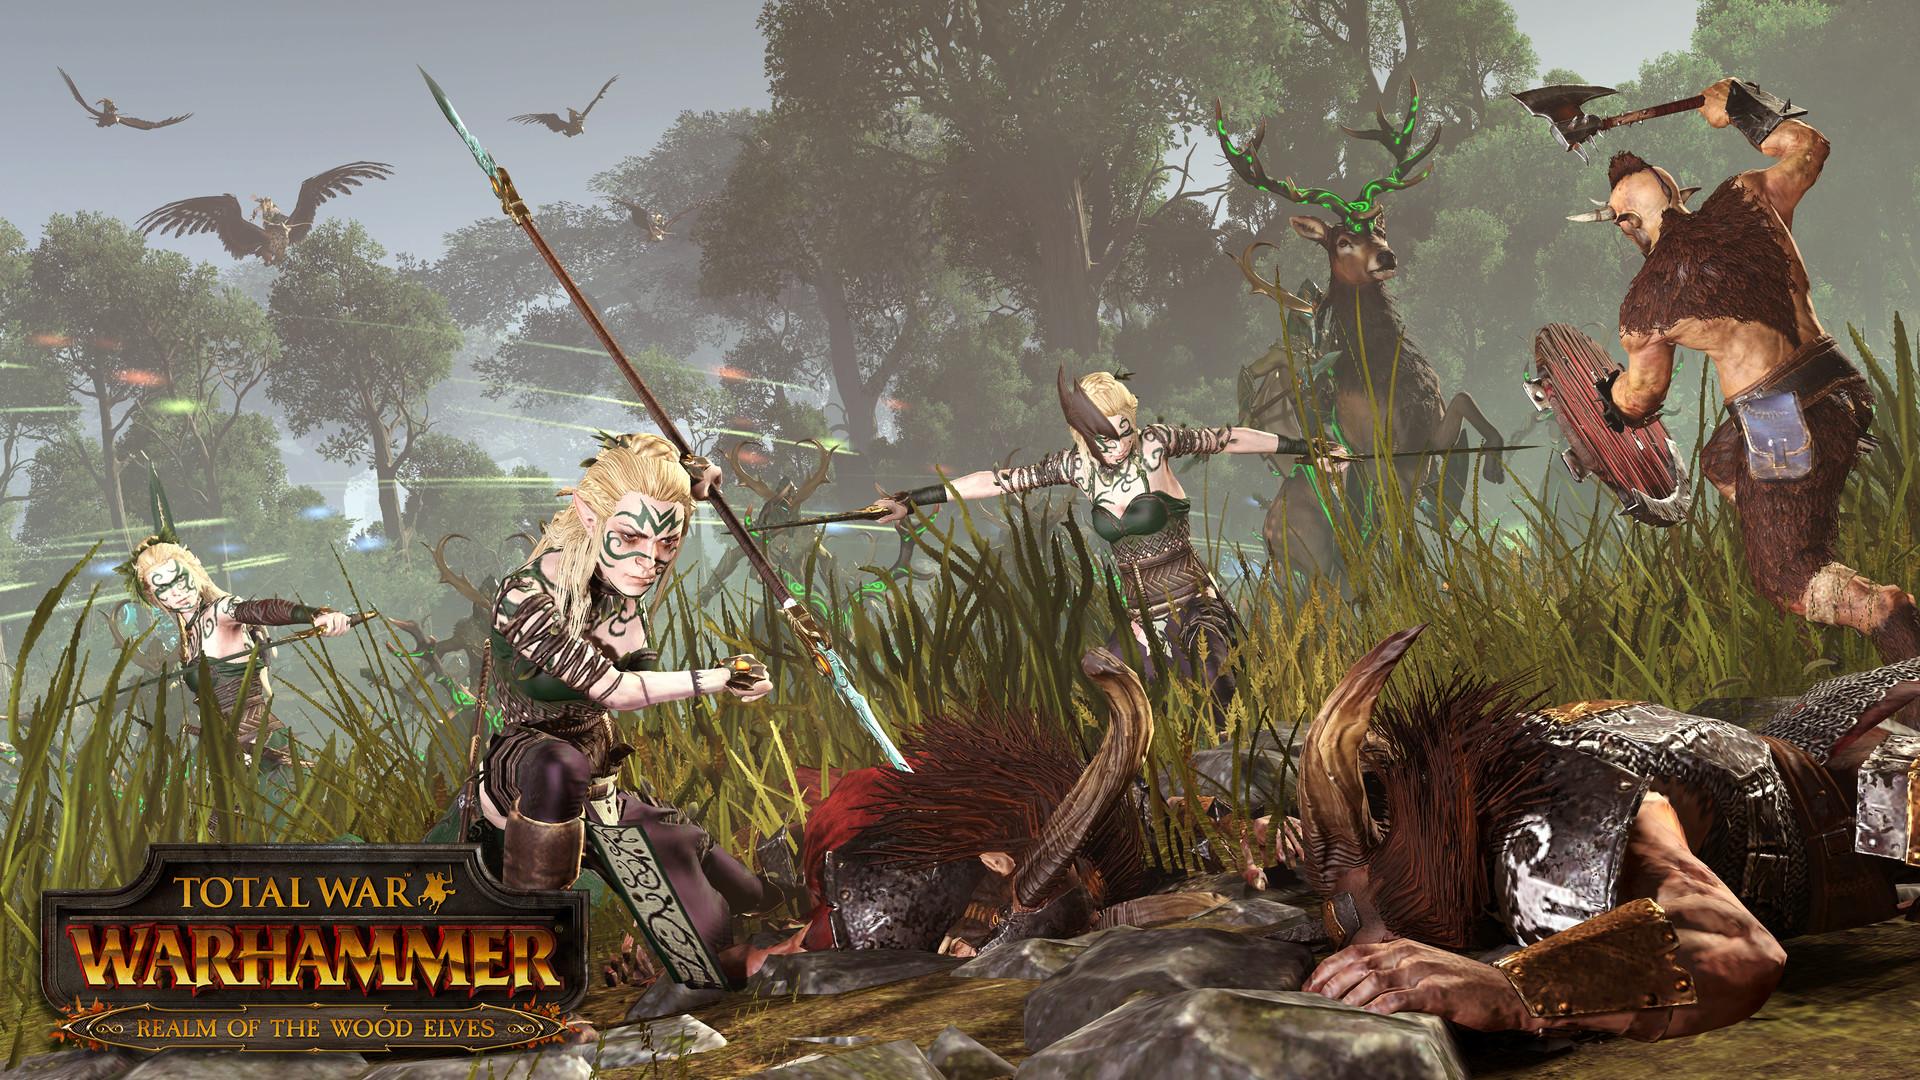 Warhammer Total War ! - Page 2 Ss_e9773f14e36e81c5759140bf00aea49181ff4f07.1920x1080